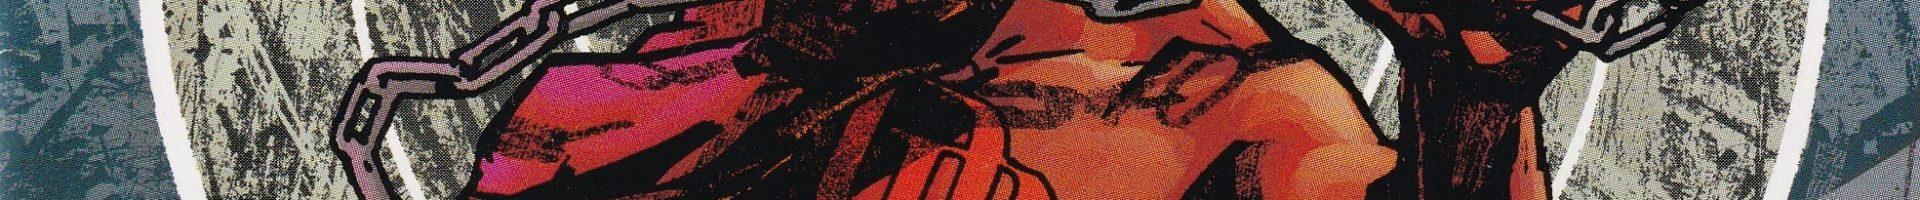 Comics You Should Own – 'Daredevil' #26-50; 56-81